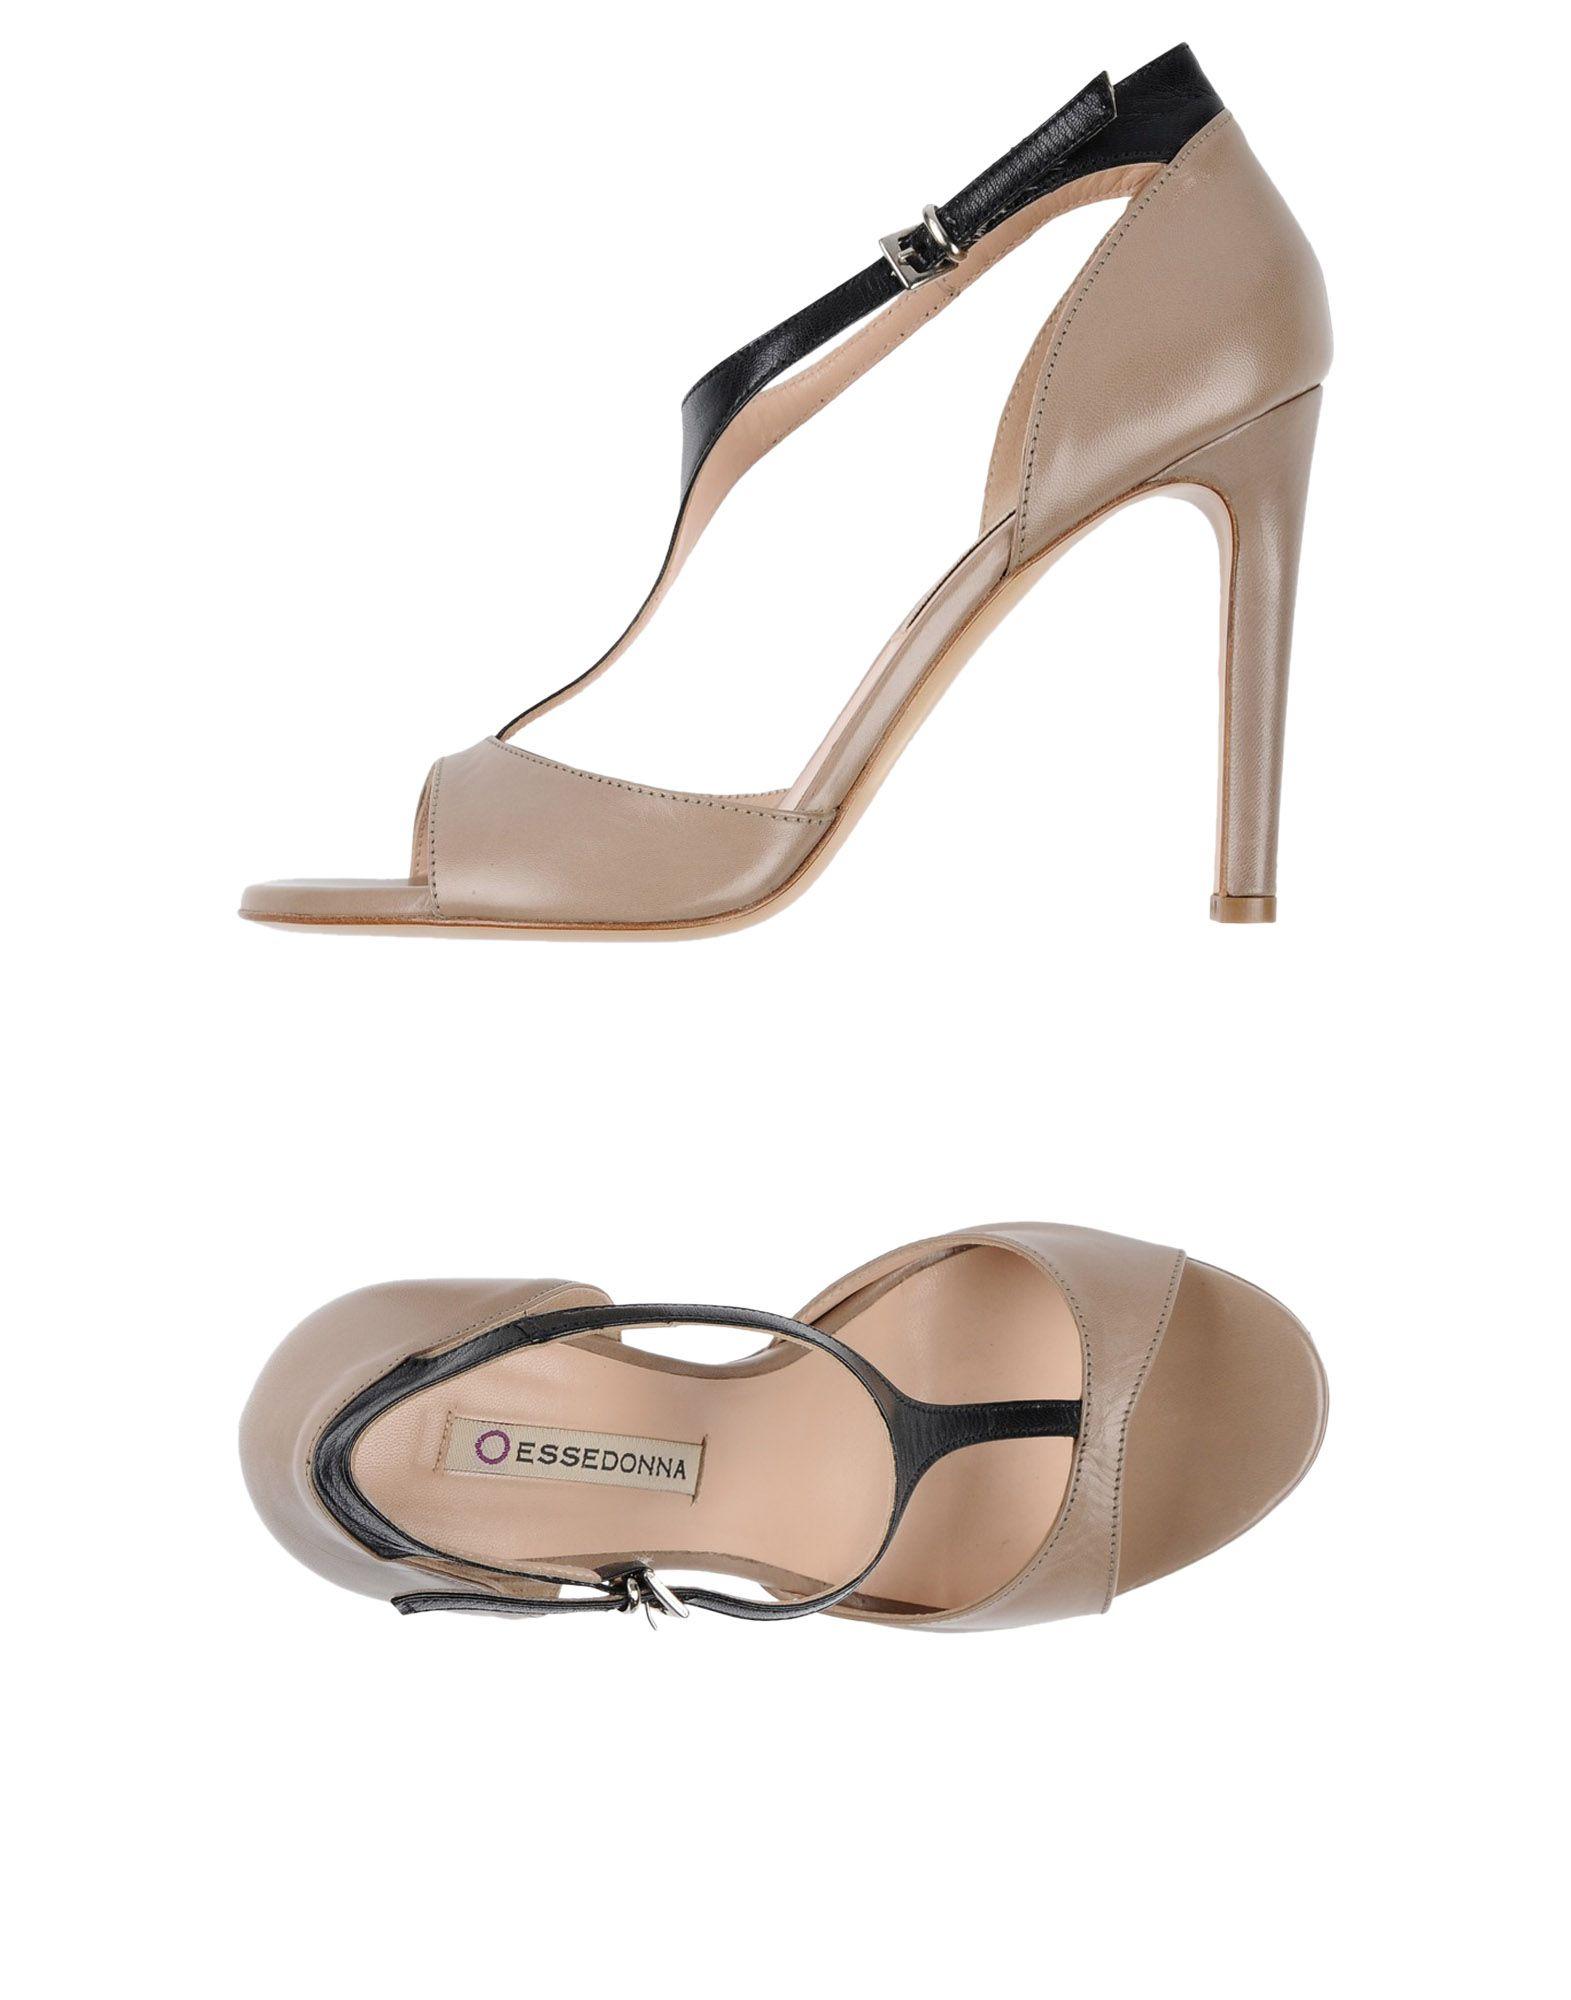 Essedonna Sandalen Damen  11457934JG Gute Qualität beliebte Schuhe